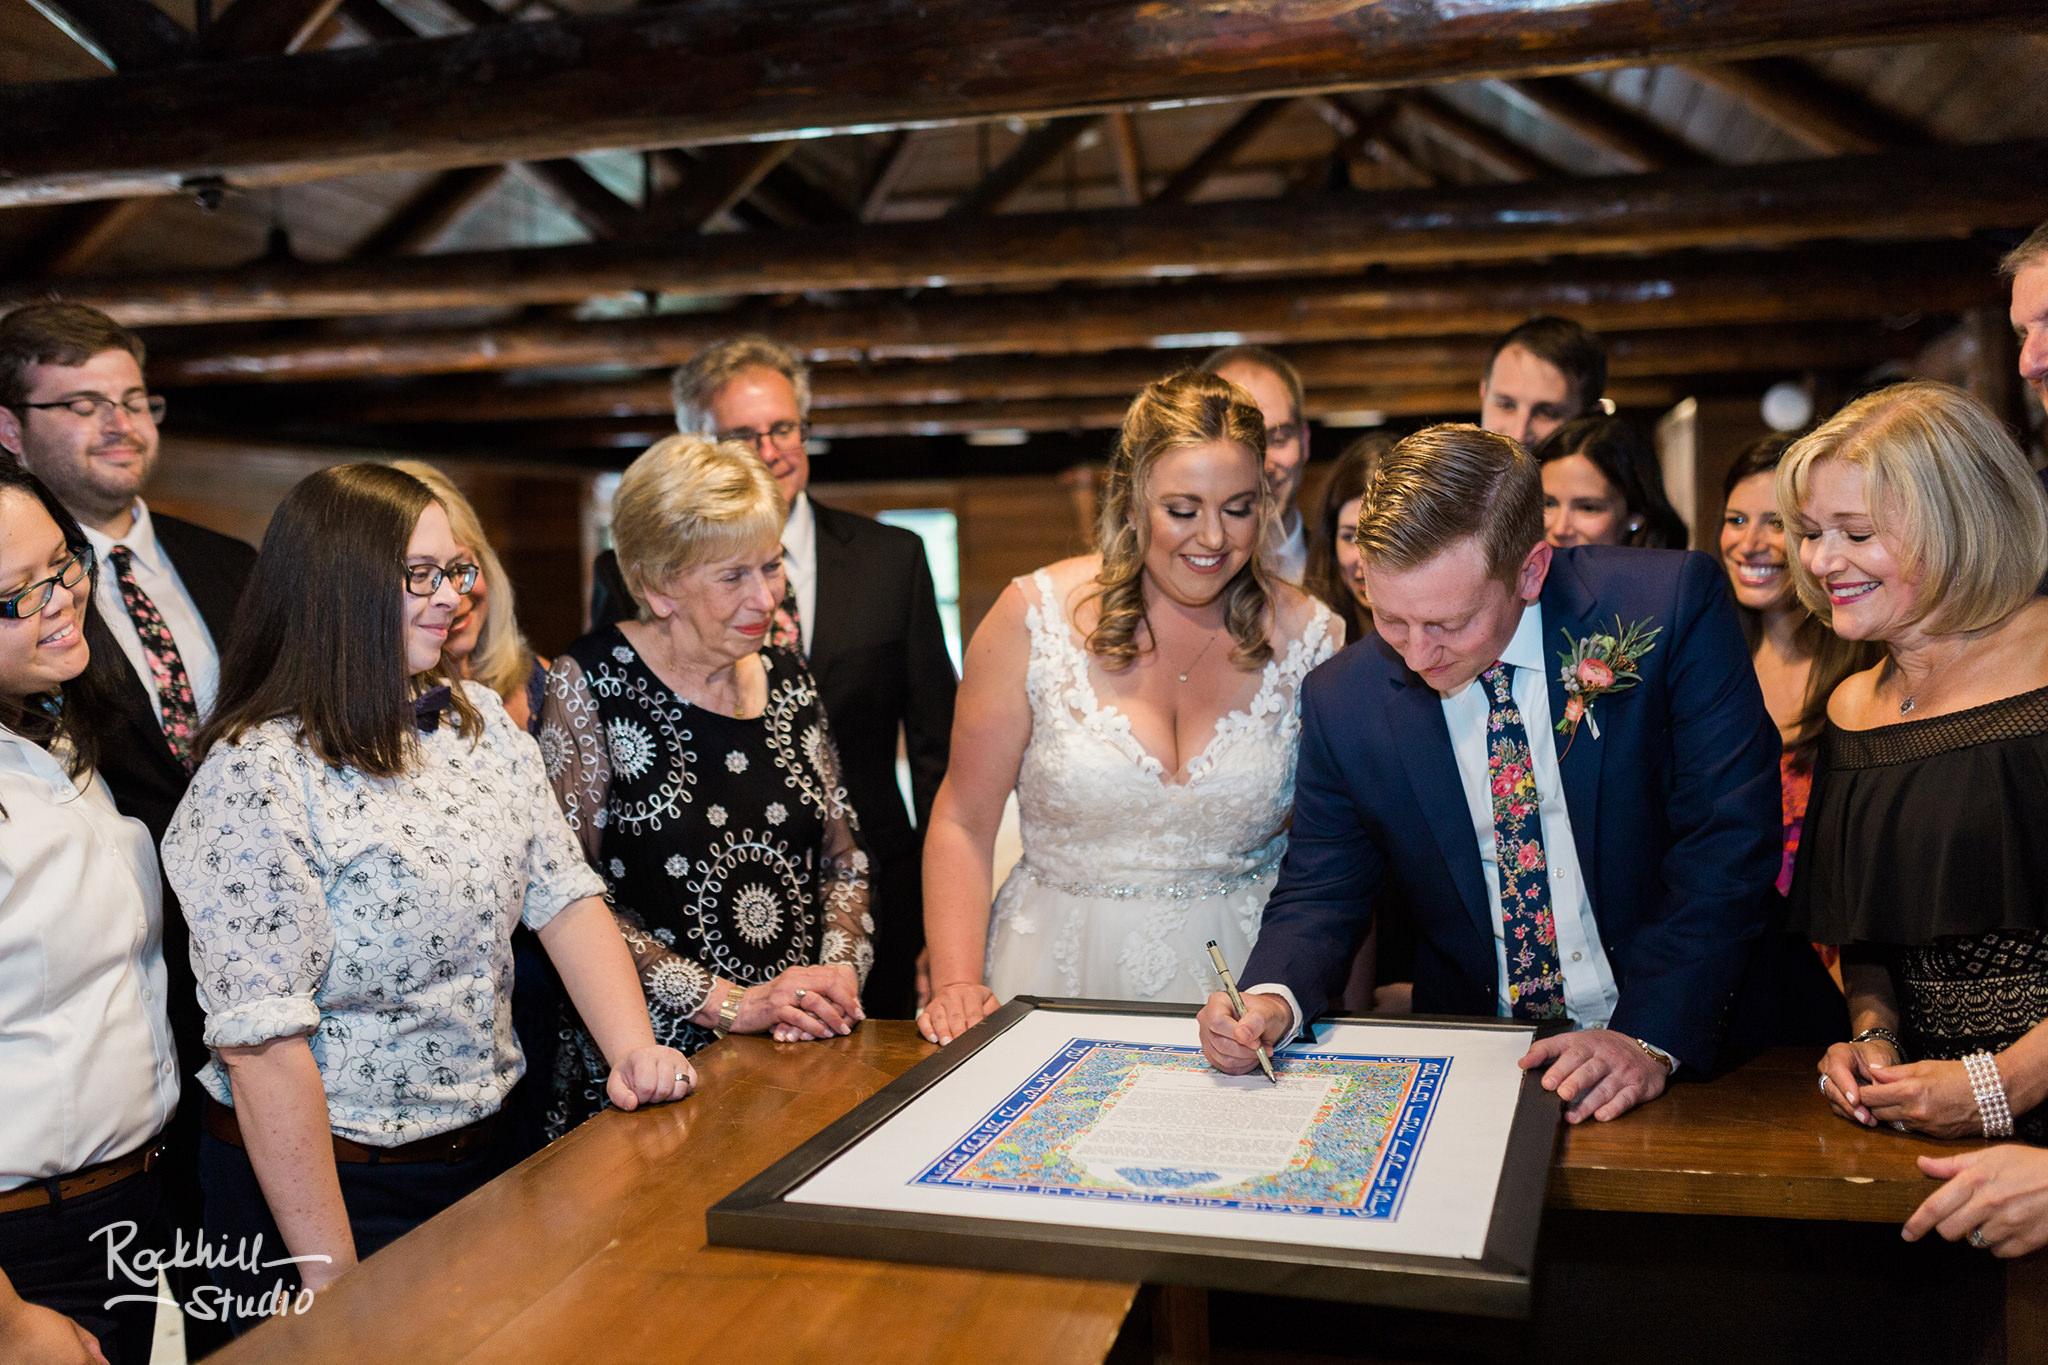 Drummond Island Wedding, ketubah signing, Traverse City Wedding Photographer Rockhill Studio